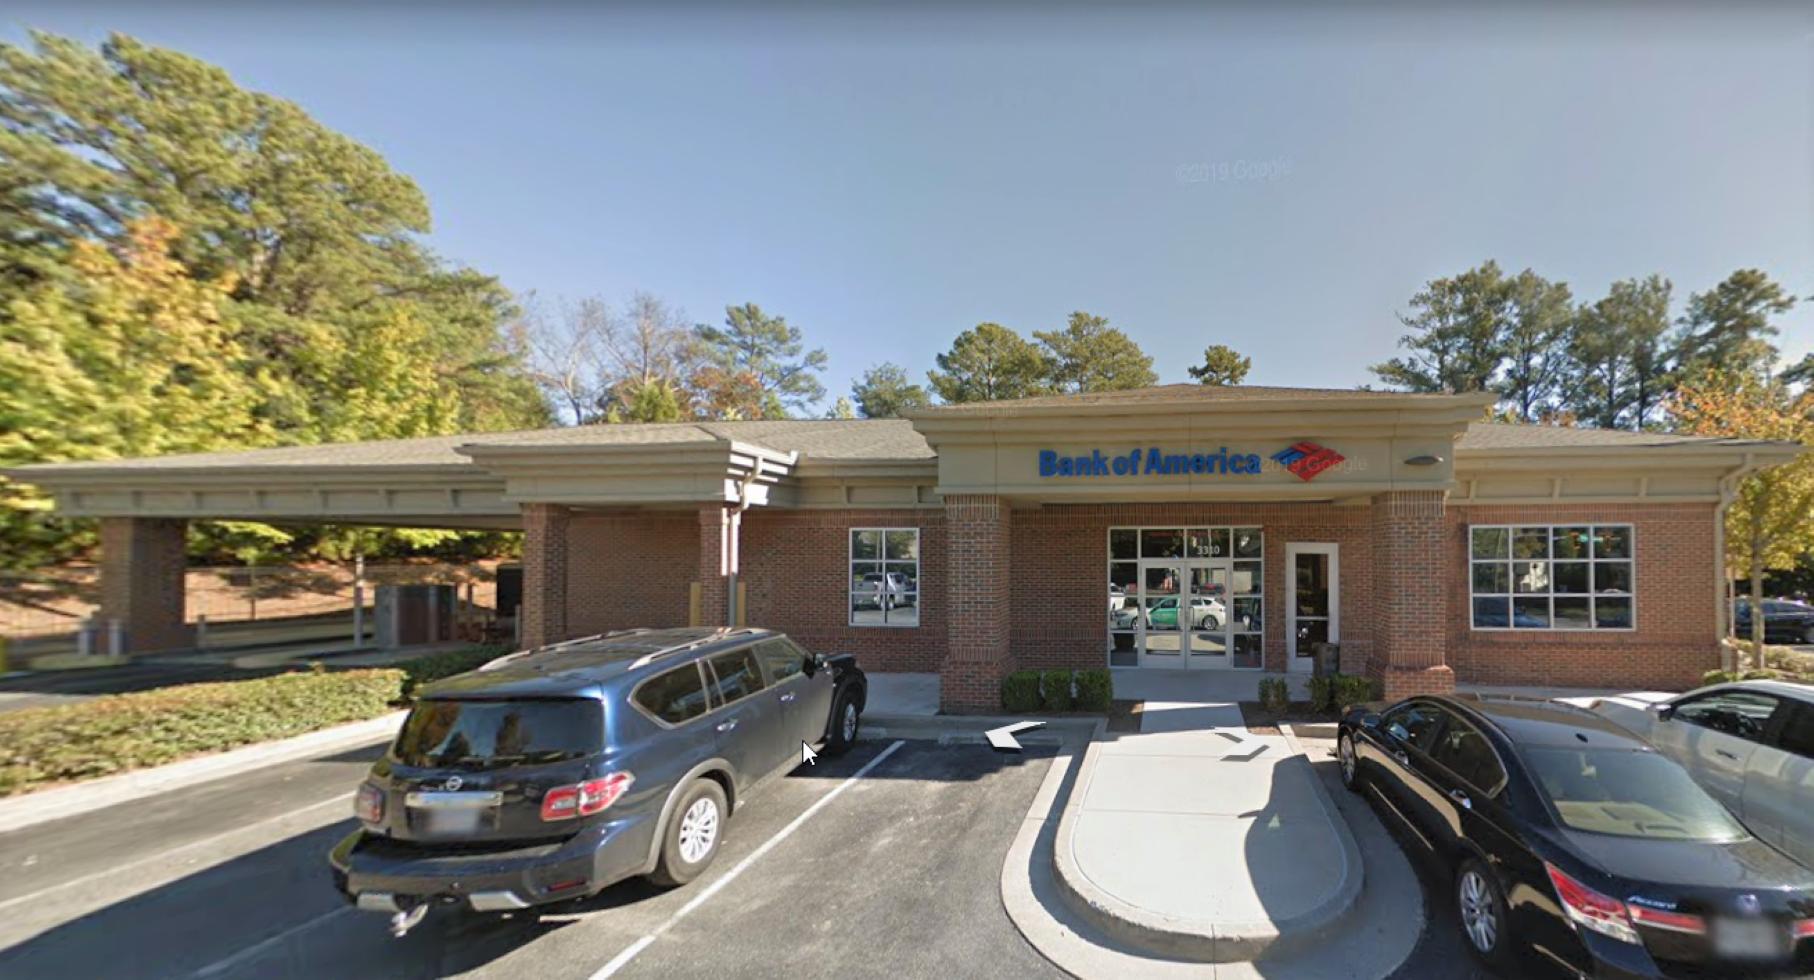 Bank of America financial center with drive-thru ATM and teller | 3310 Old Alabama Rd, Alpharetta, GA 30022